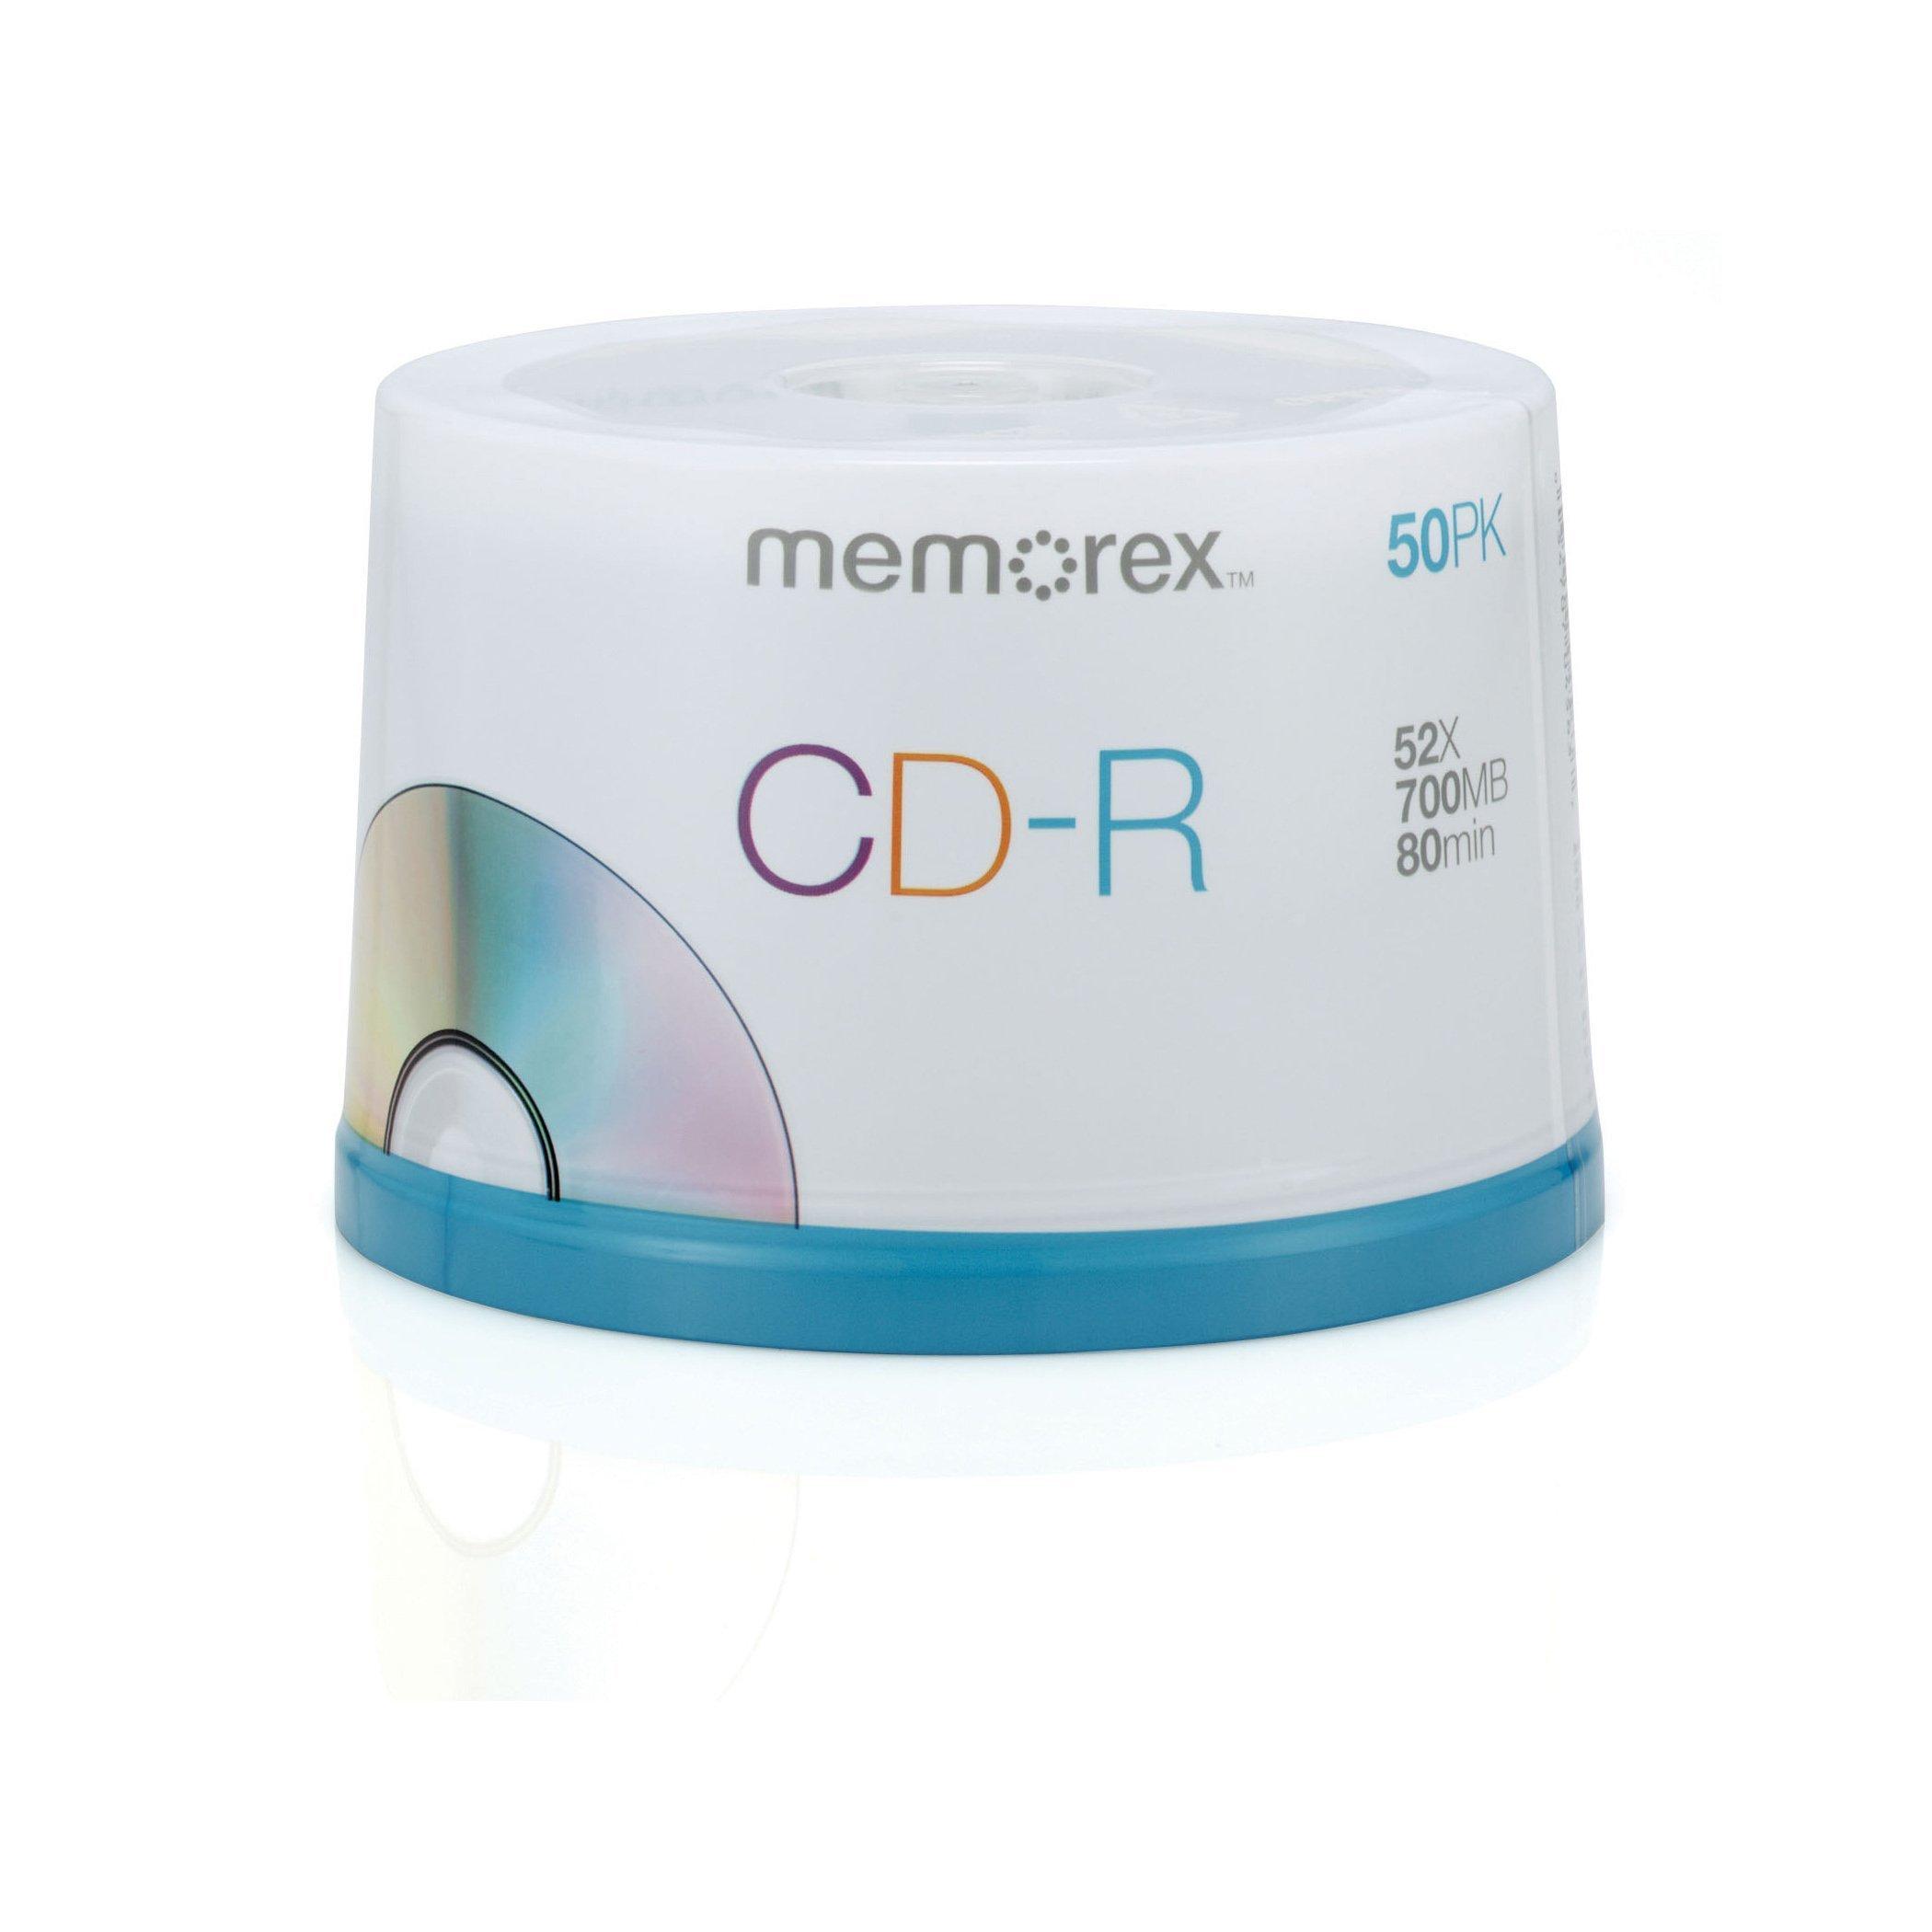 Memorex 700MB/80-Minute 52x Data CD-R Media 50-Pack Spindle